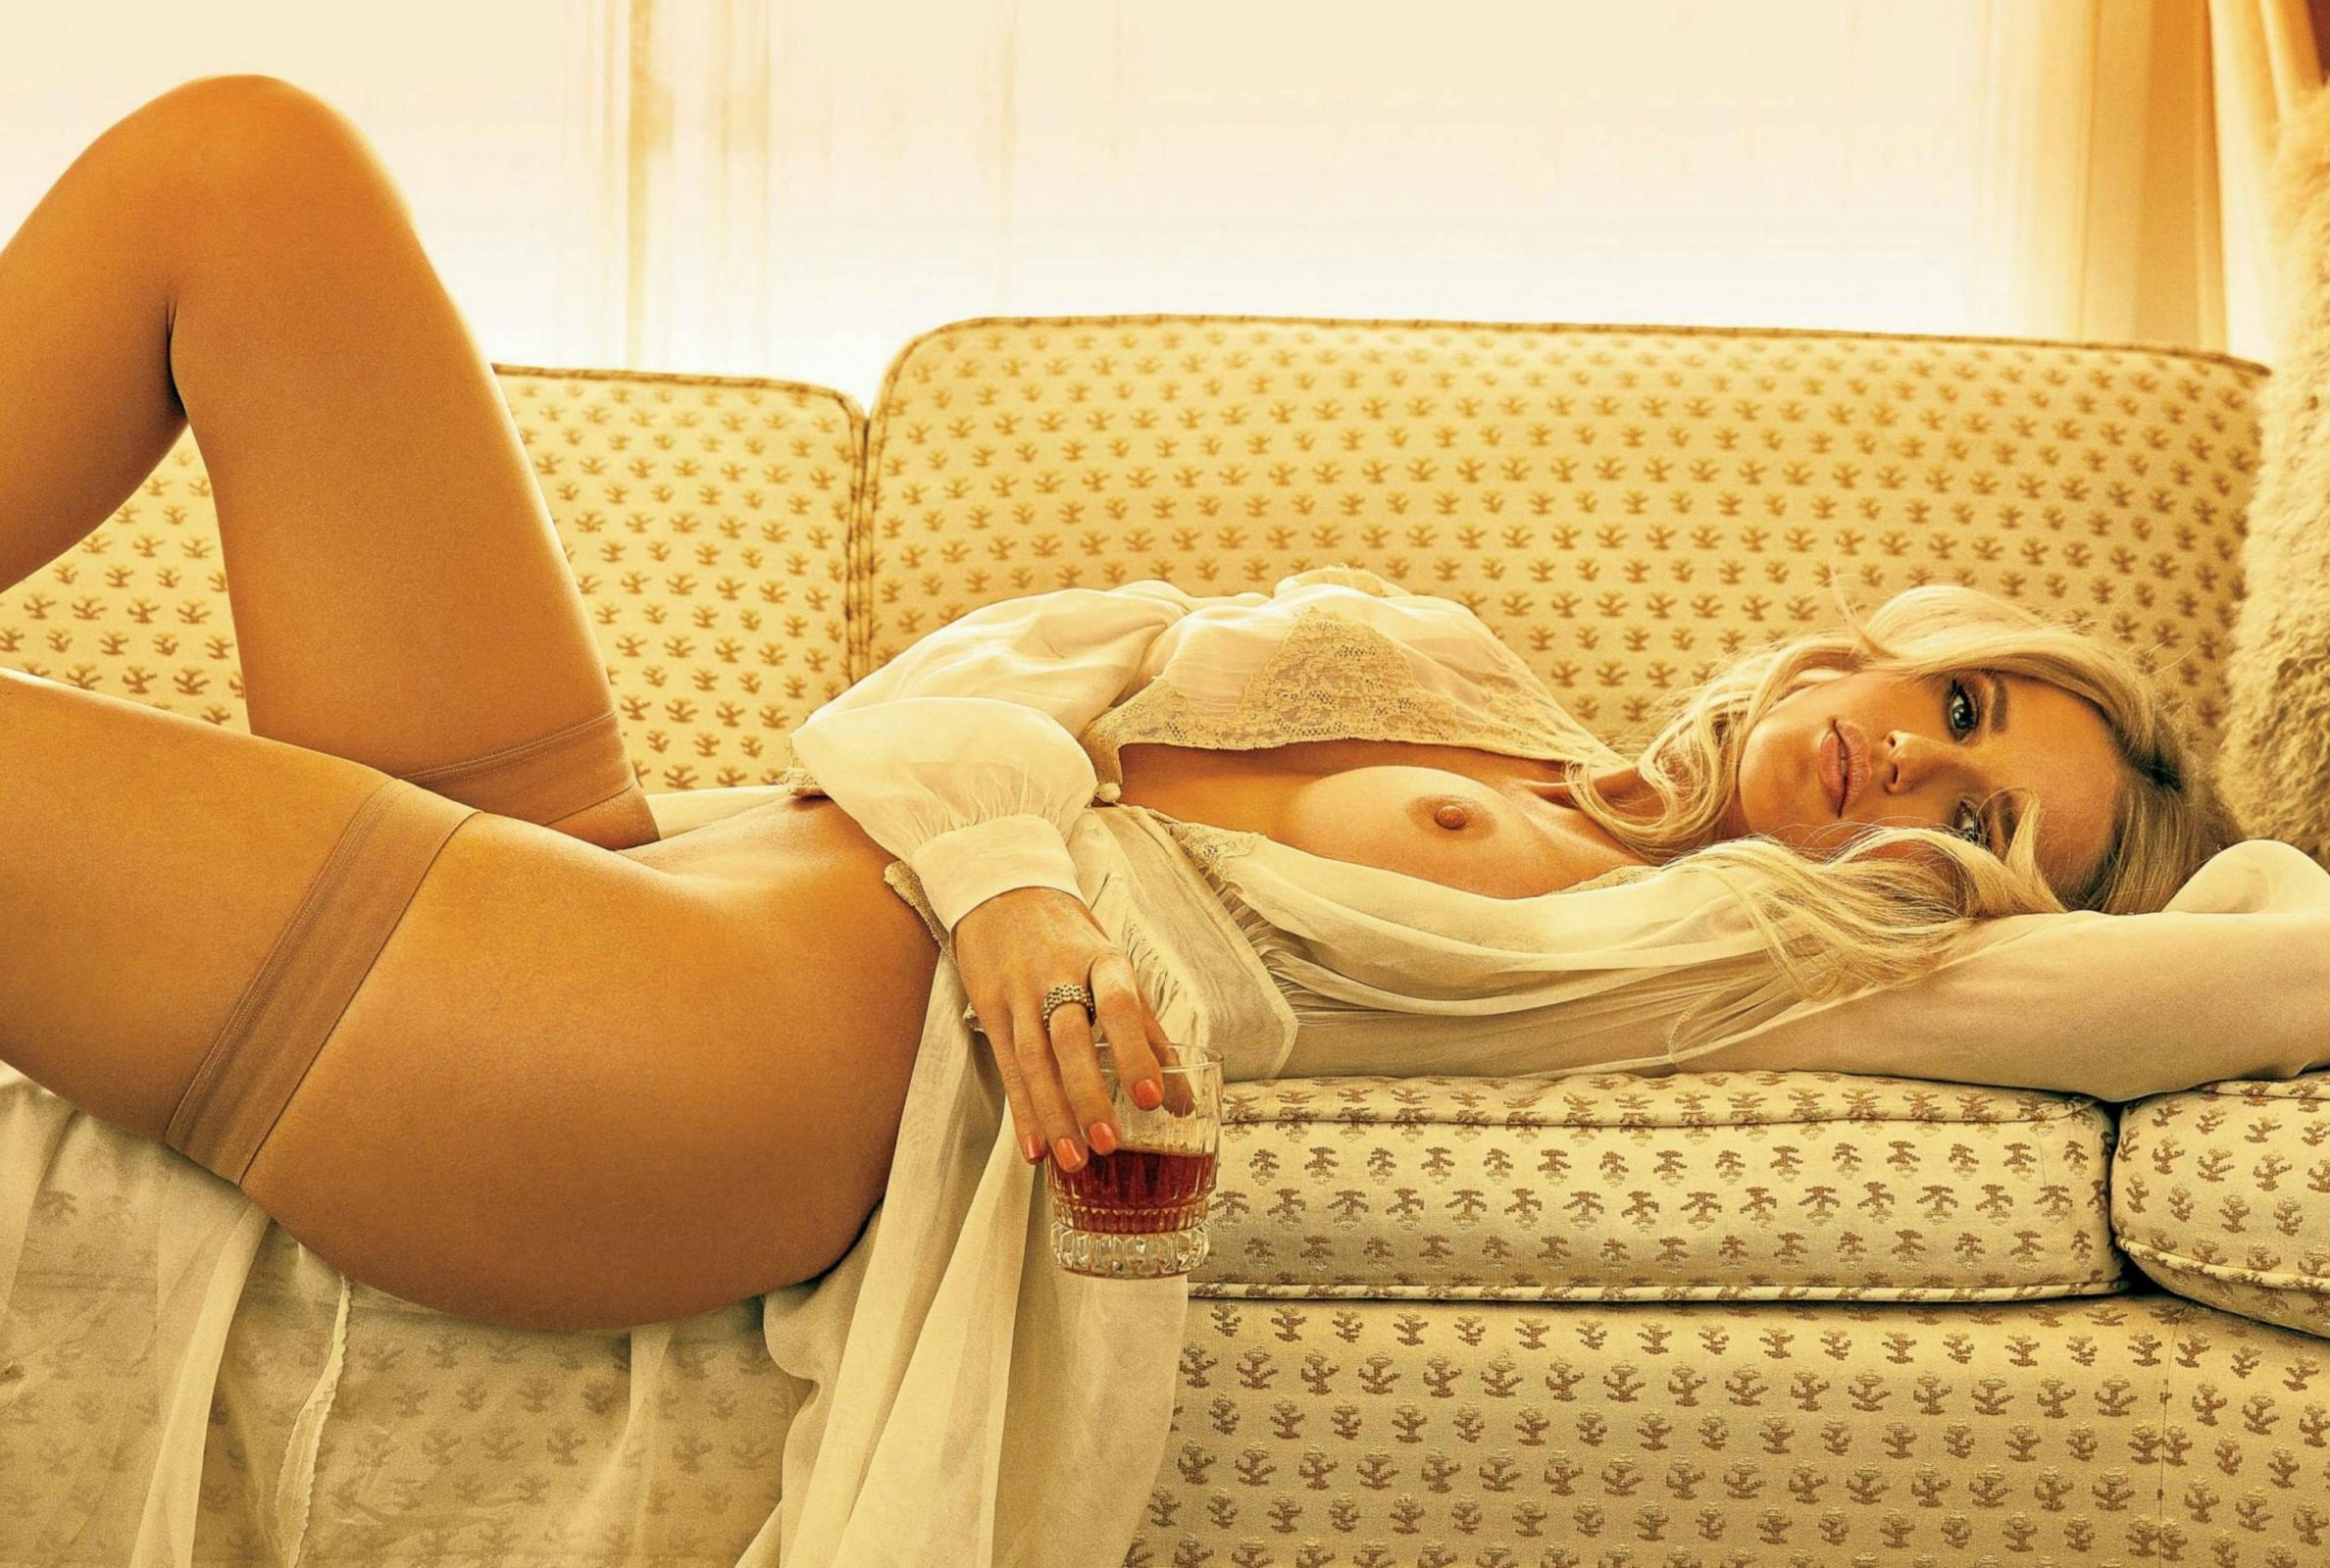 Playboy rachel mortenson nude piece